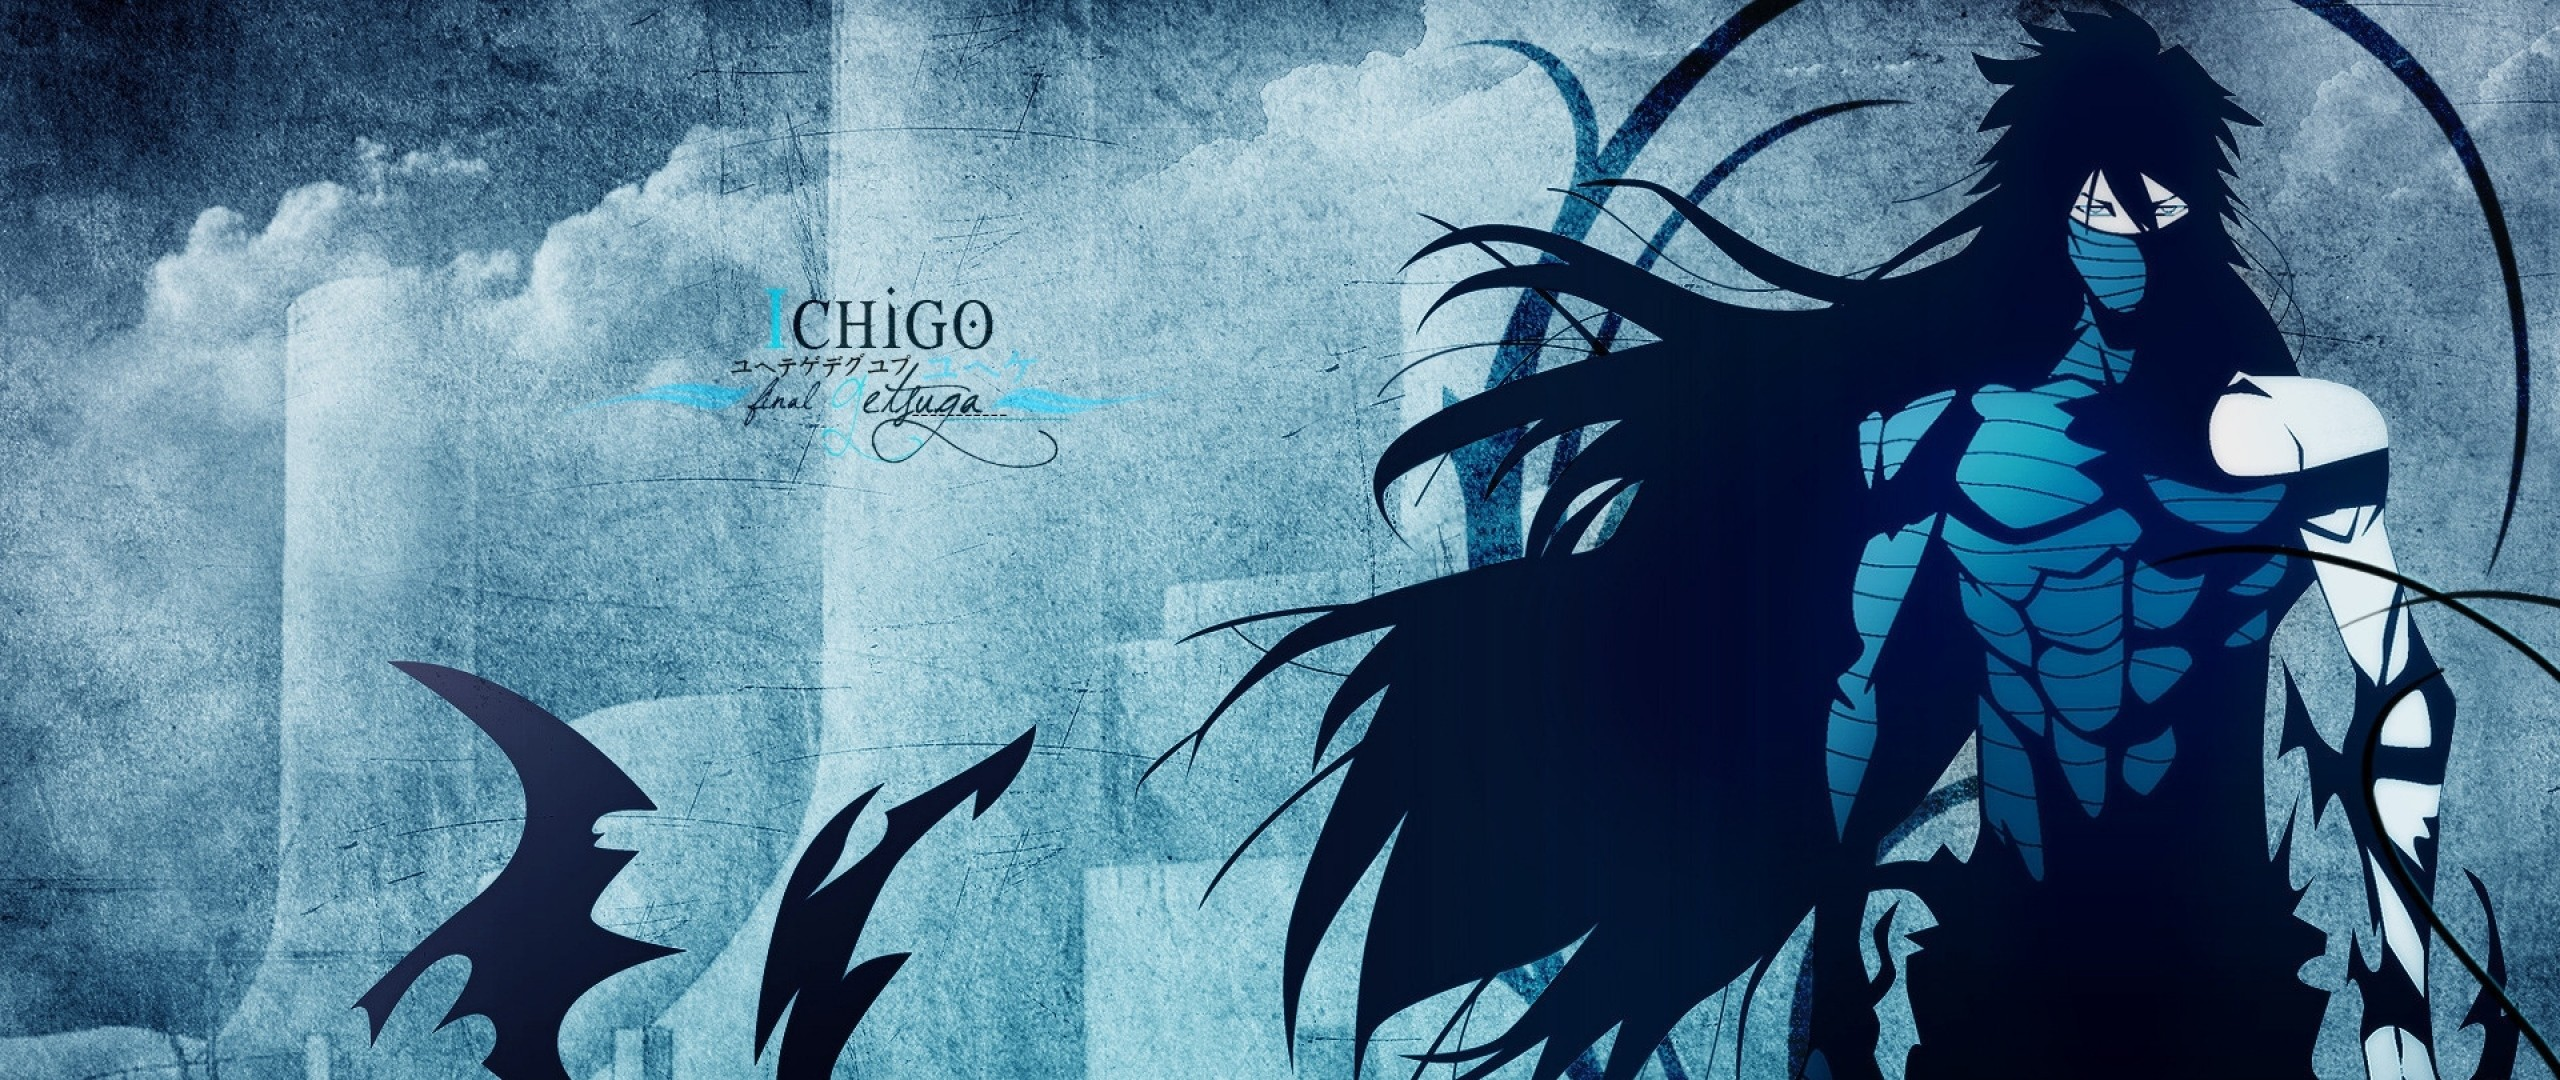 2560x1080 Preview Wallpaper Ichigo Mugetsu Bleach Final Getsuga Boy Shadow